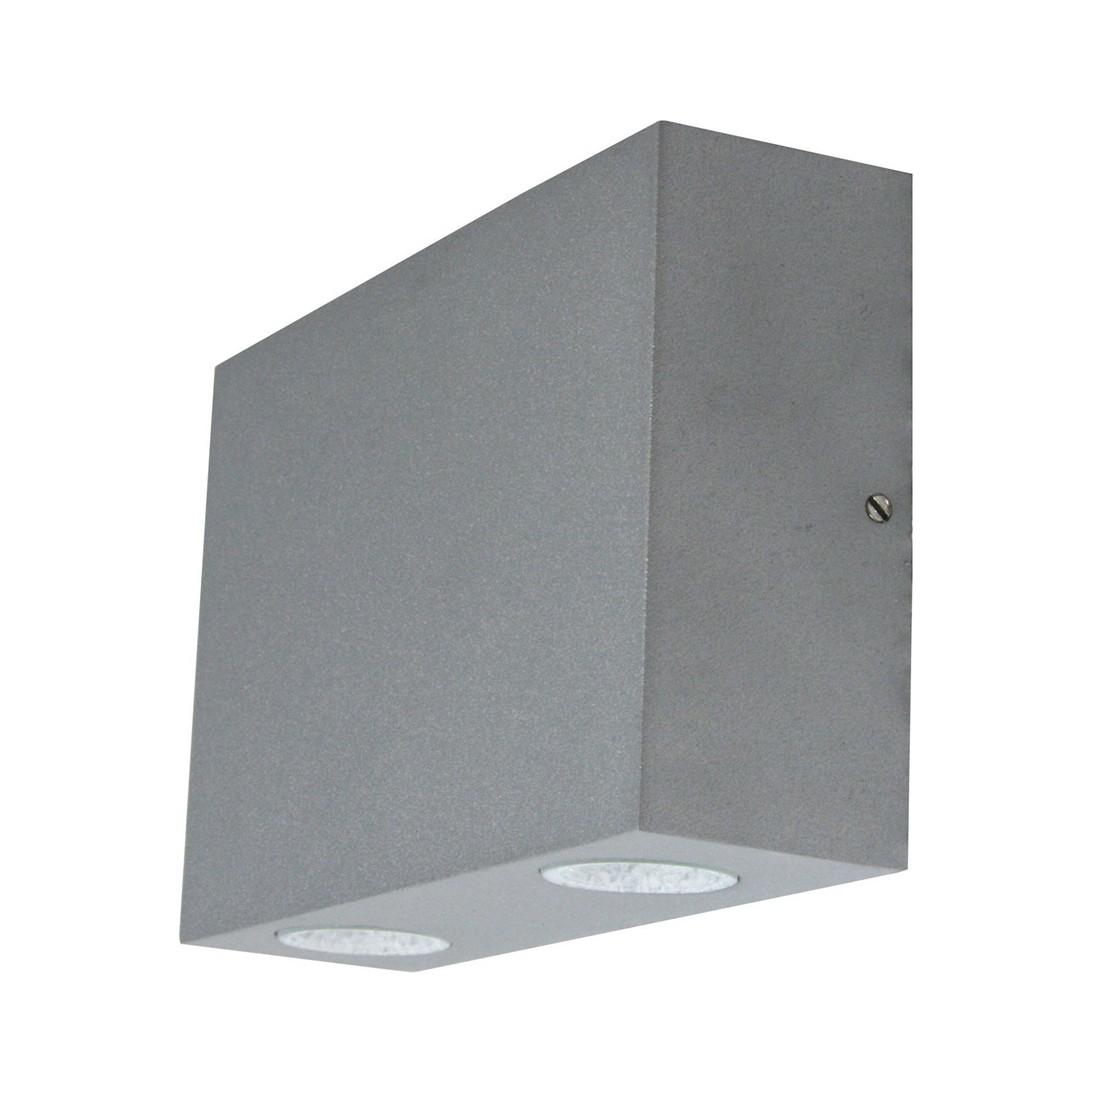 Außenleuchte Milo LED ● Aluminium-Druckguss Silbergrau- Heitronic